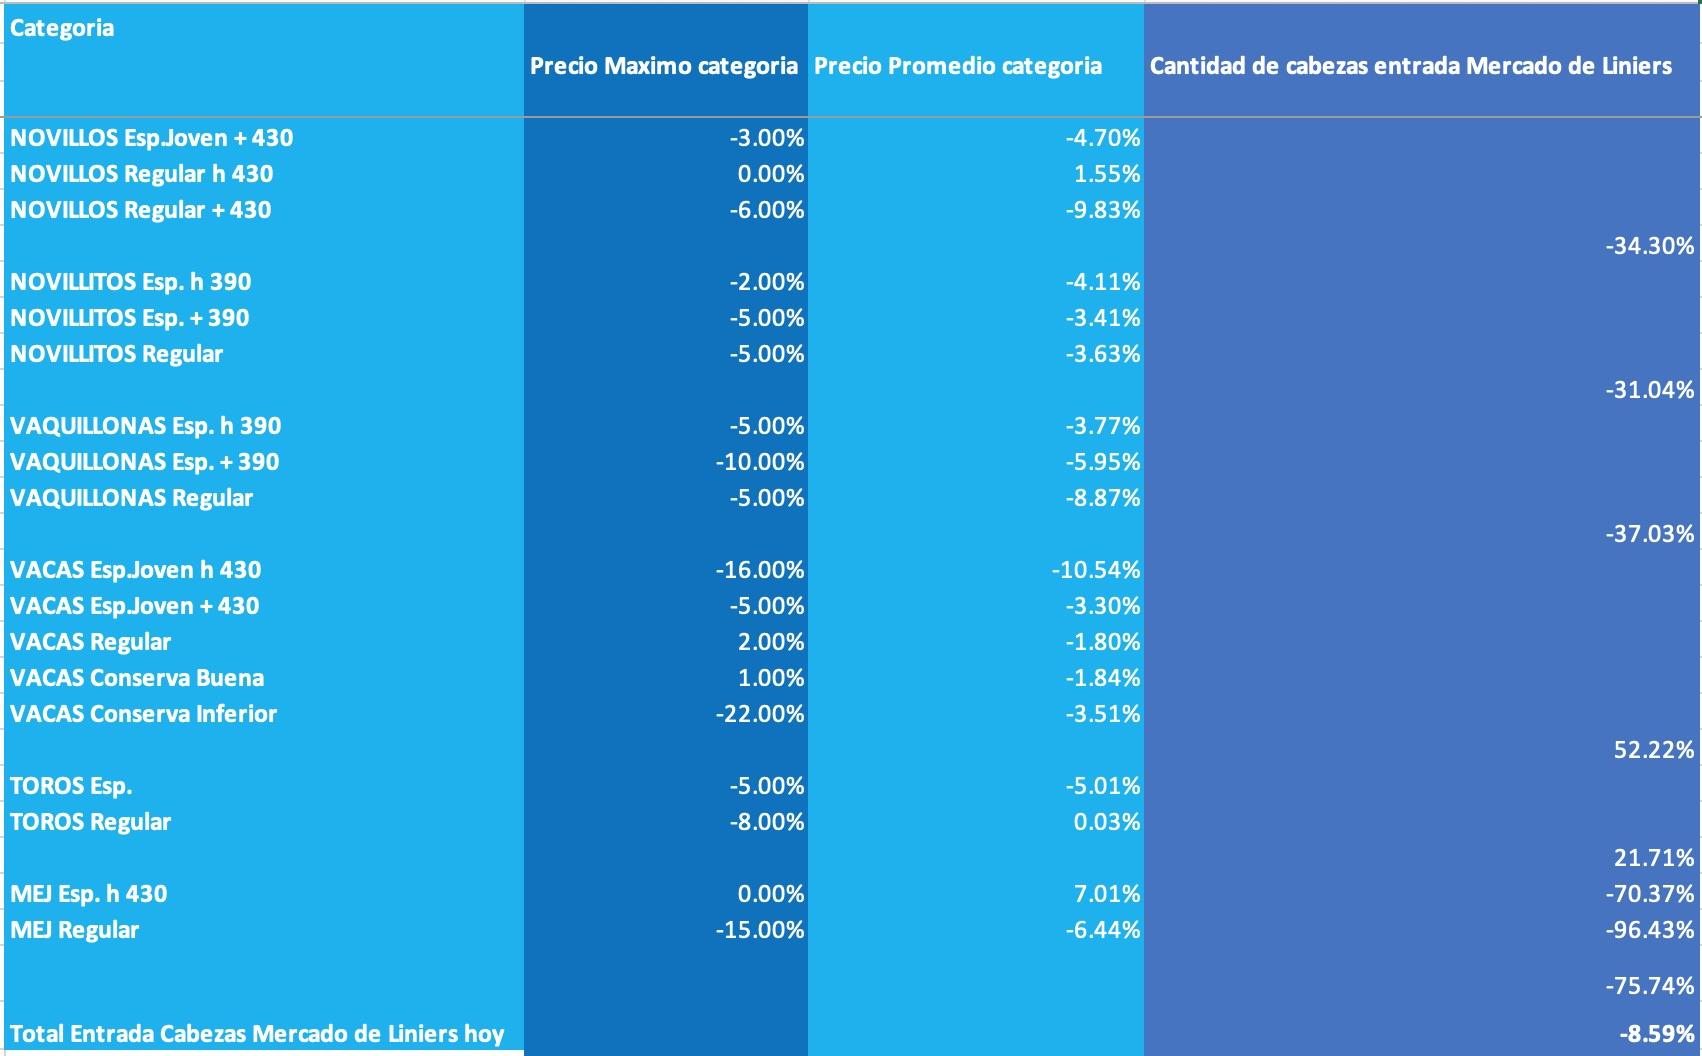 mercado de liniers precios por categoria semanal 8 abril 2020